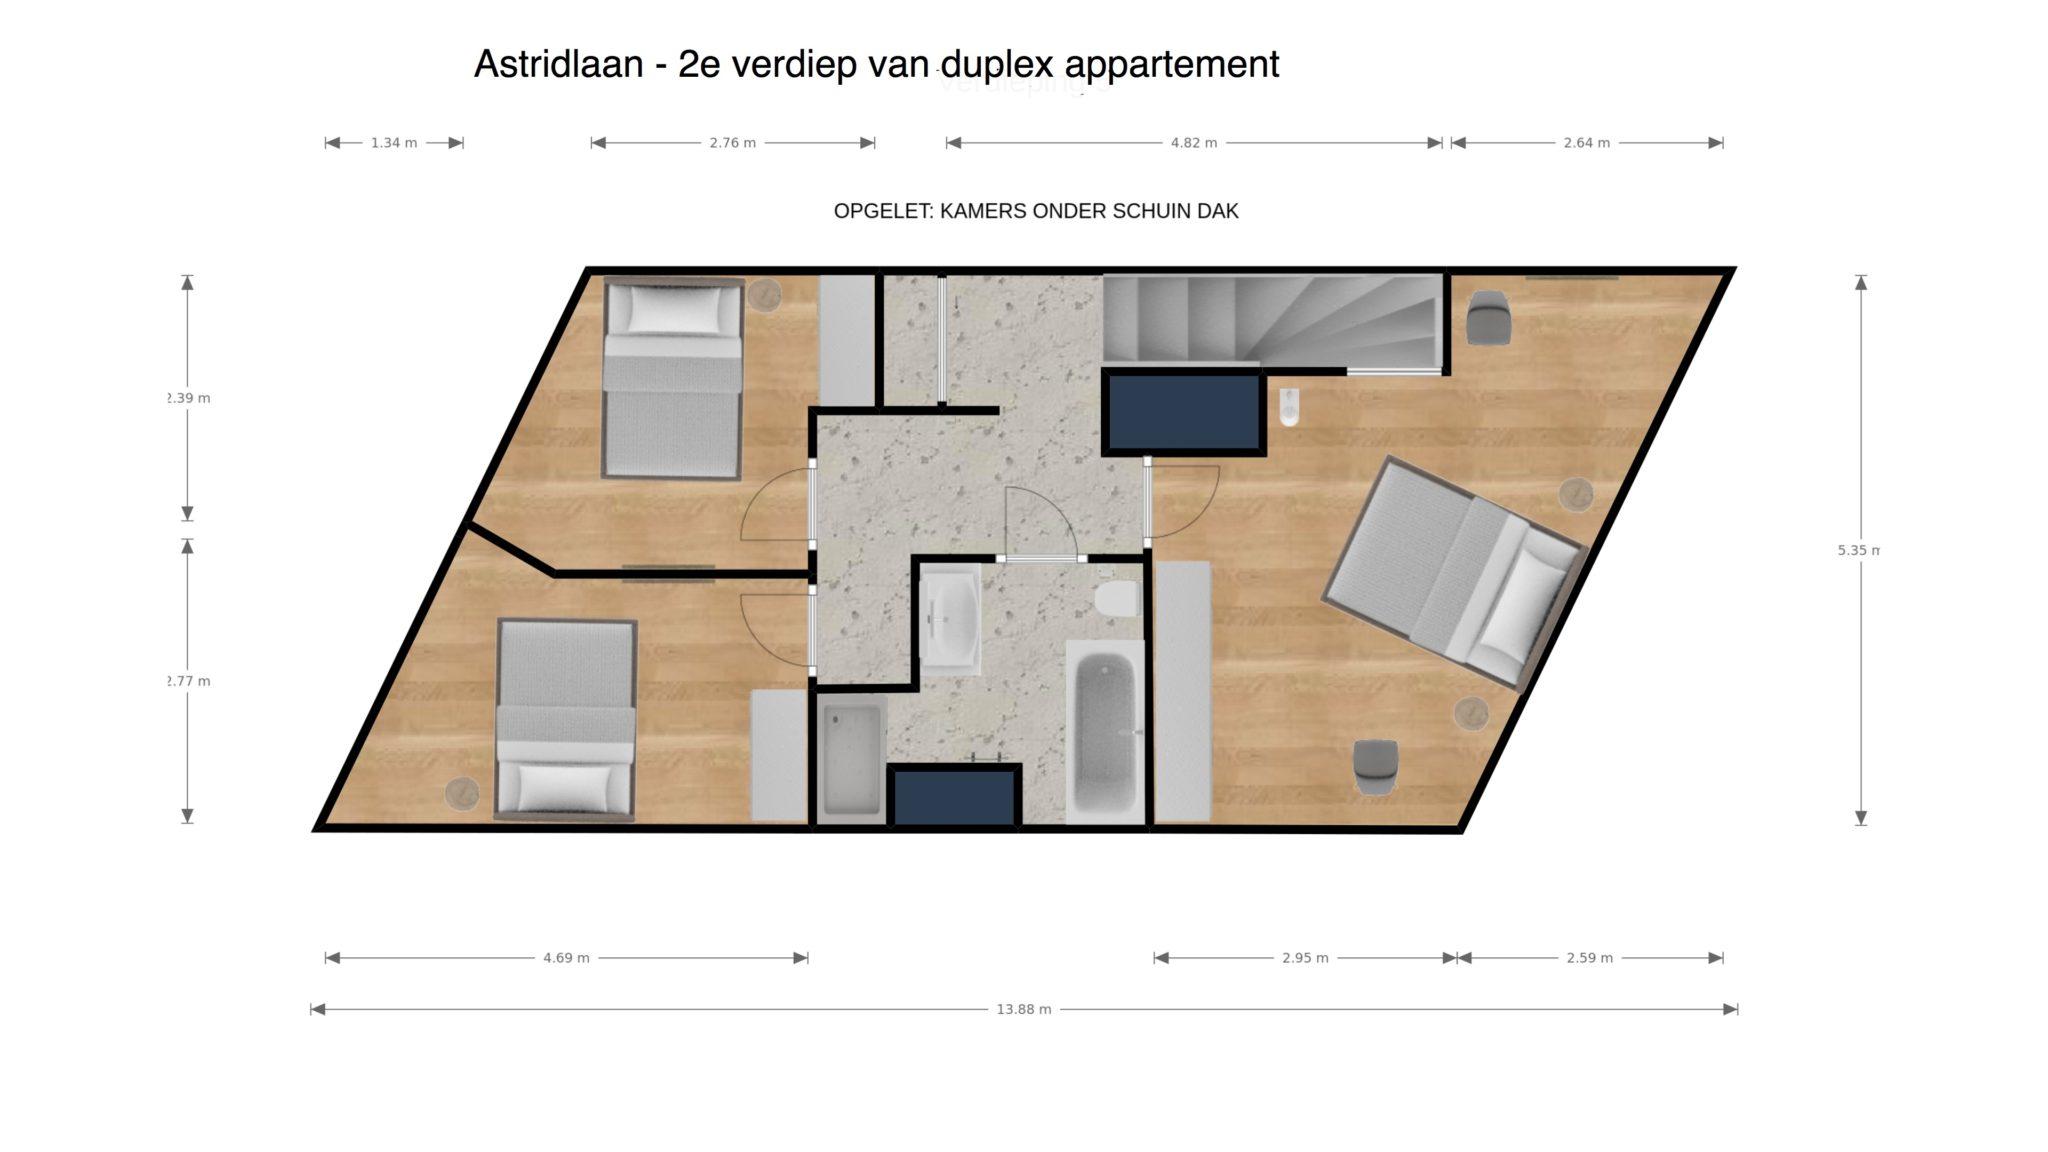 Astridlaan duplex 2e verdiep 2D plan